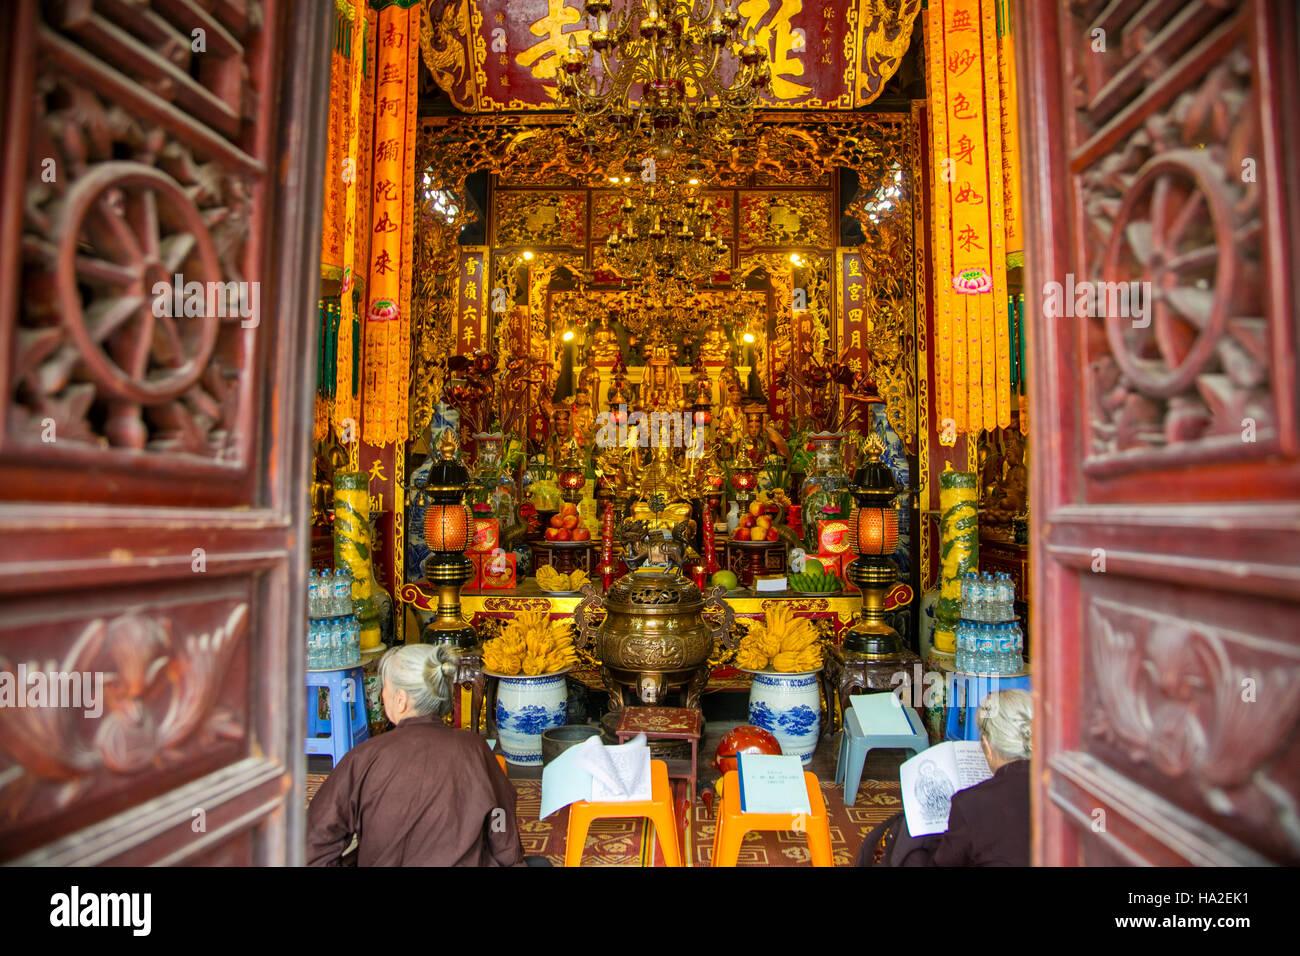 Chua Mot Cot, Buddhist Temple, Hanoi, Vietnam, Asia - Stock Image